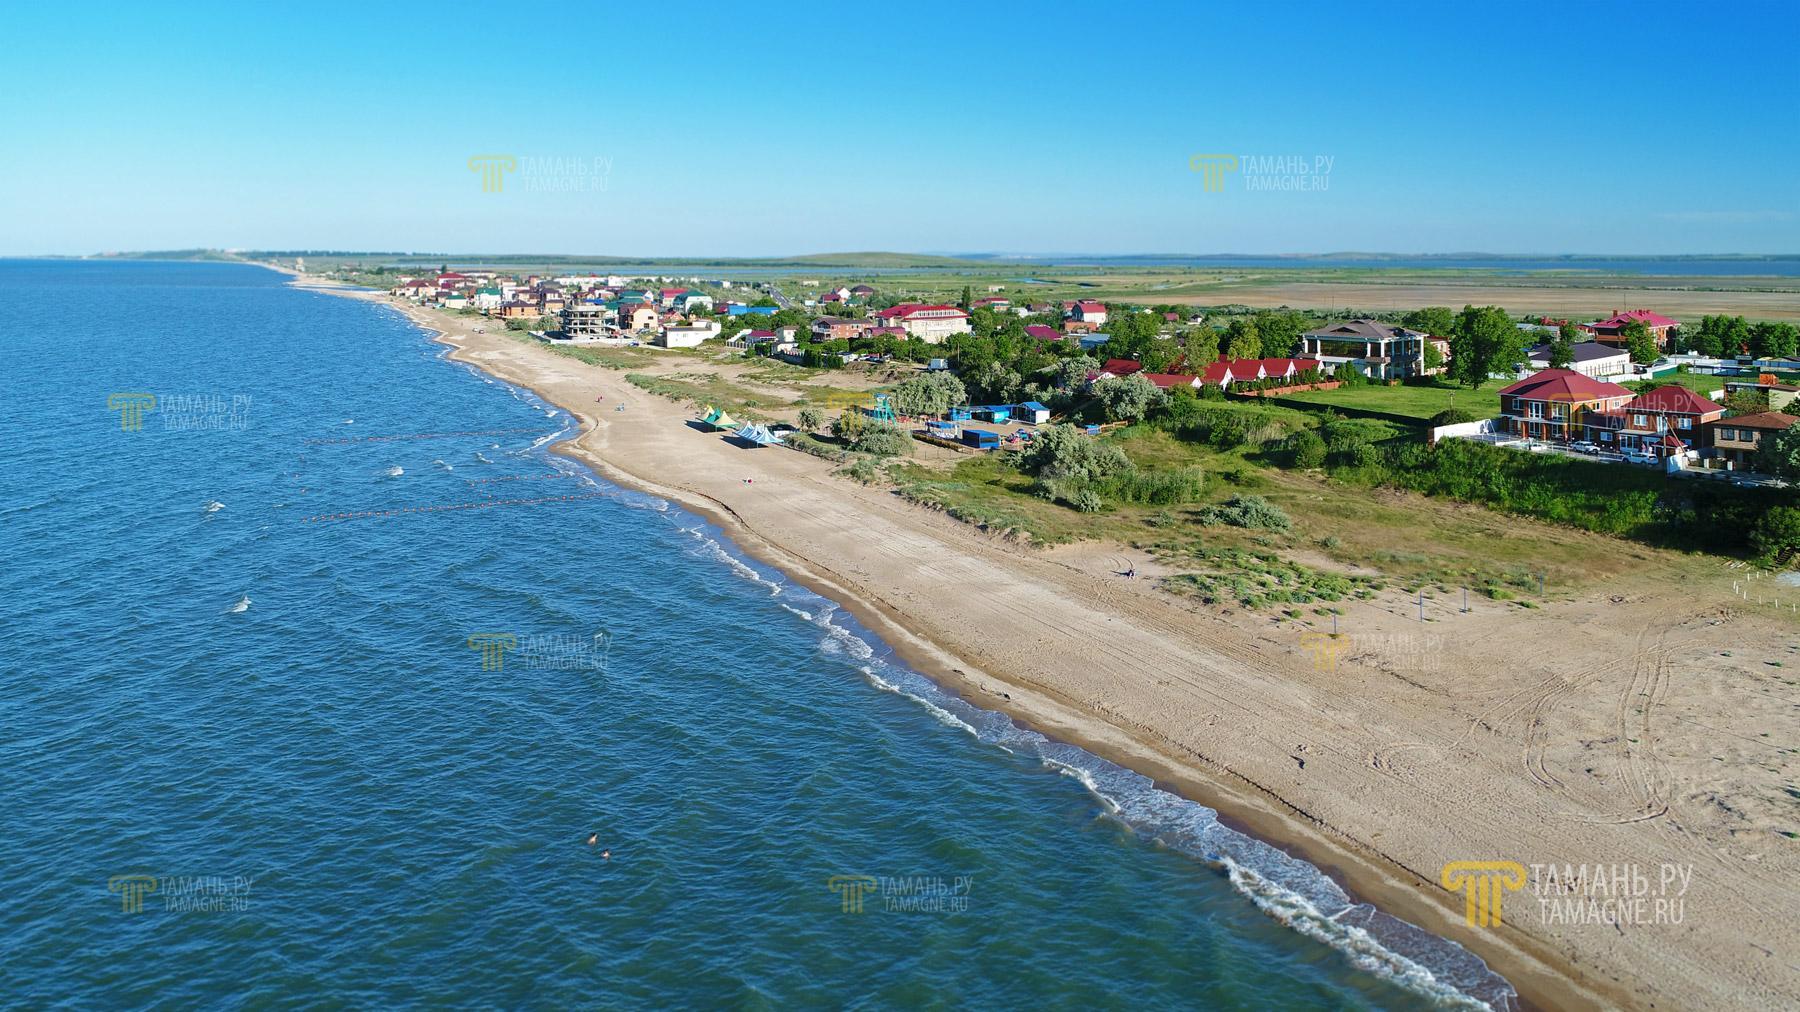 Тамань фото поселка и пляжей